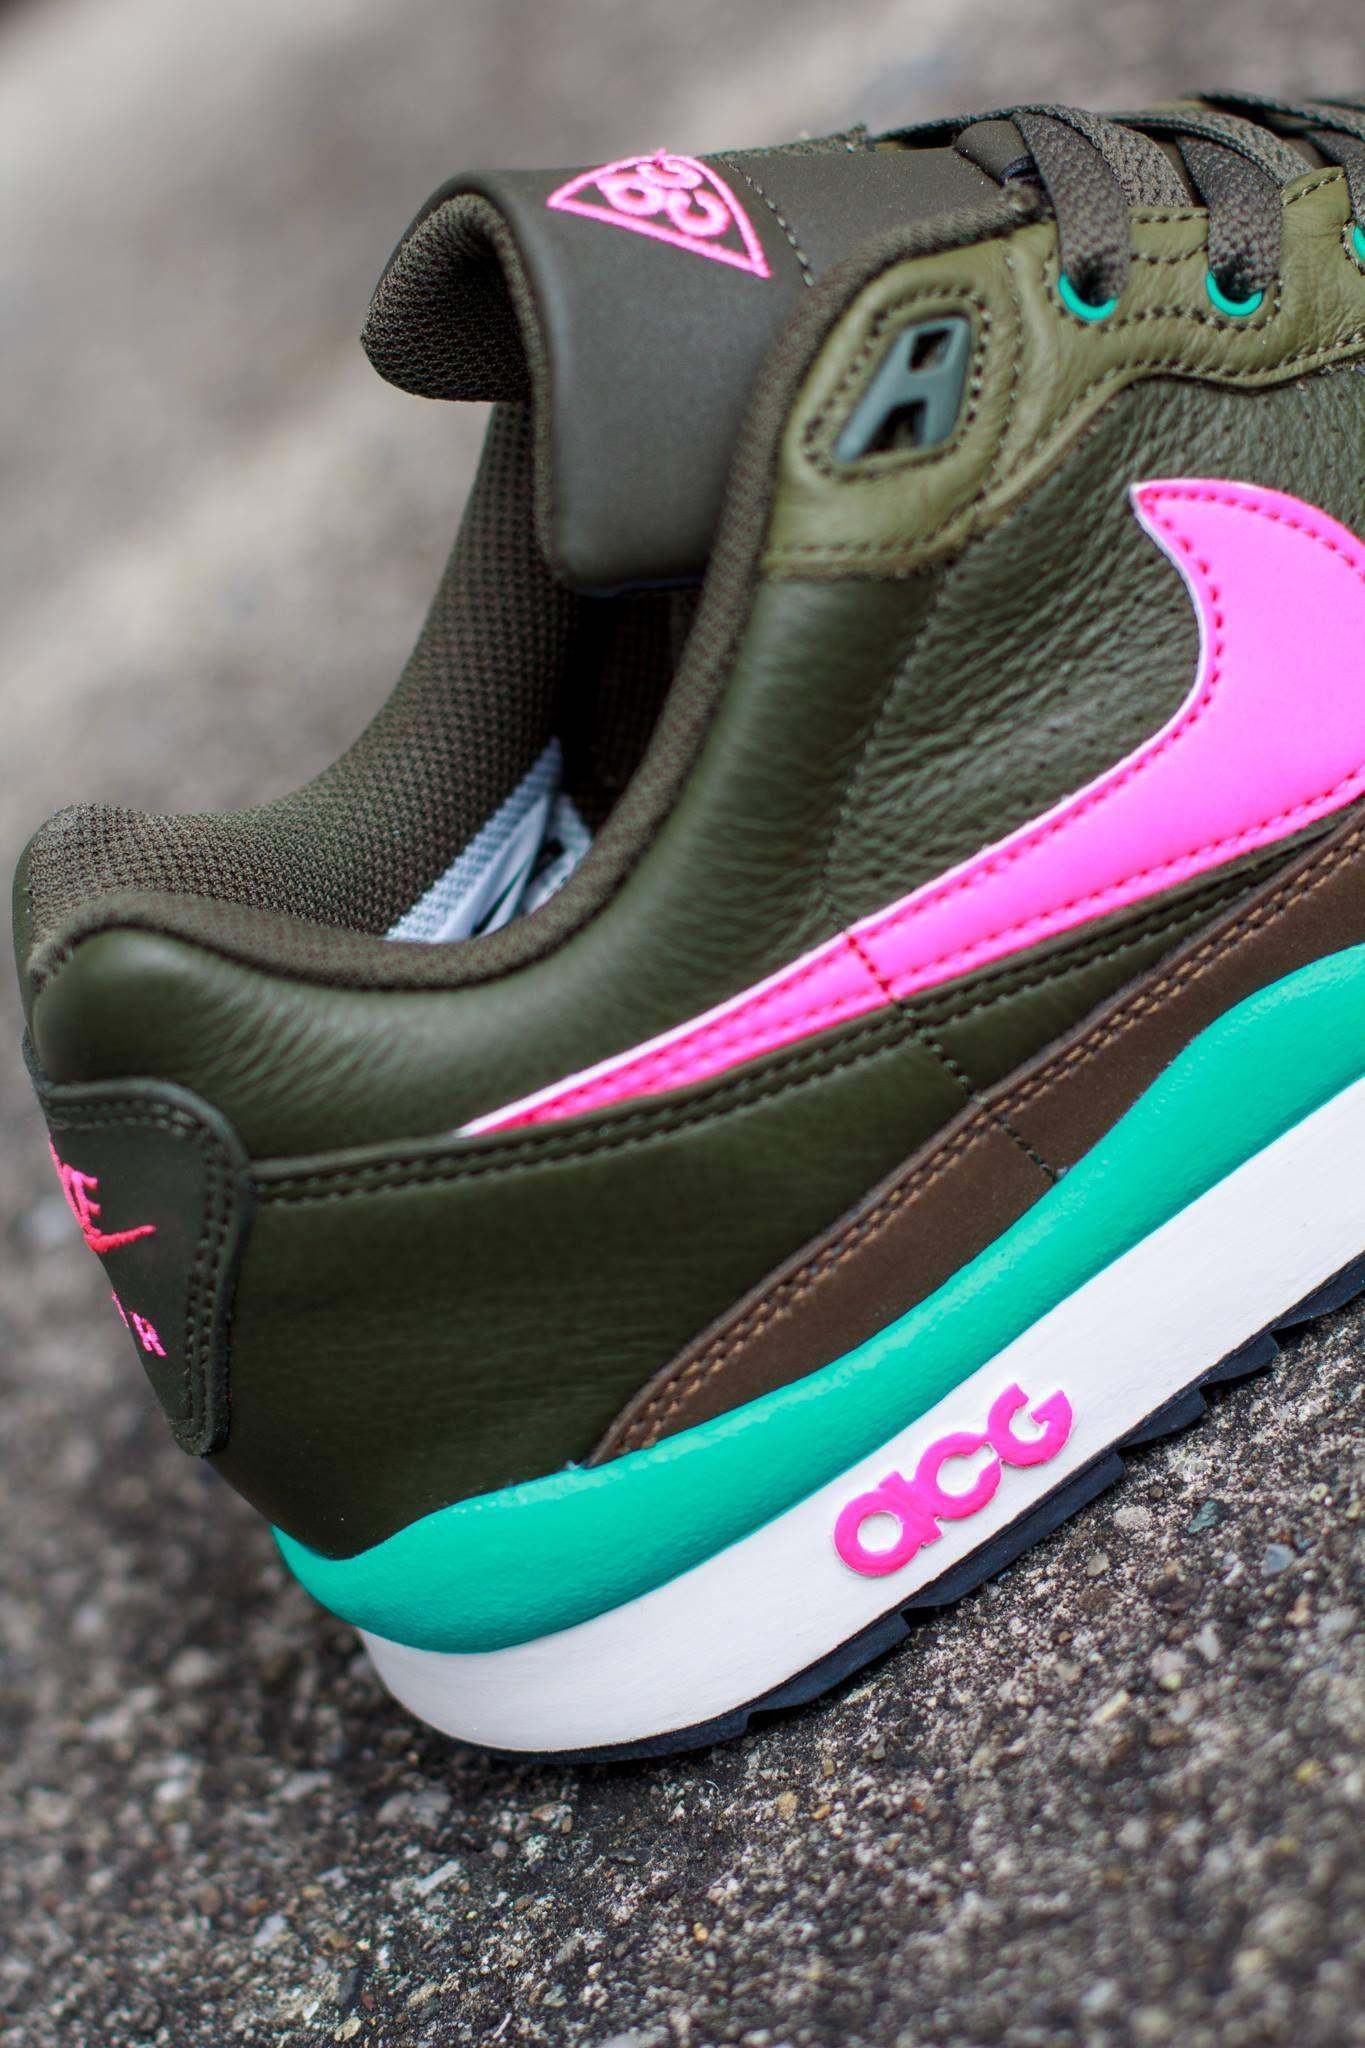 b52dea96e221 Nike Air Wildwood LE  Cargo Pink